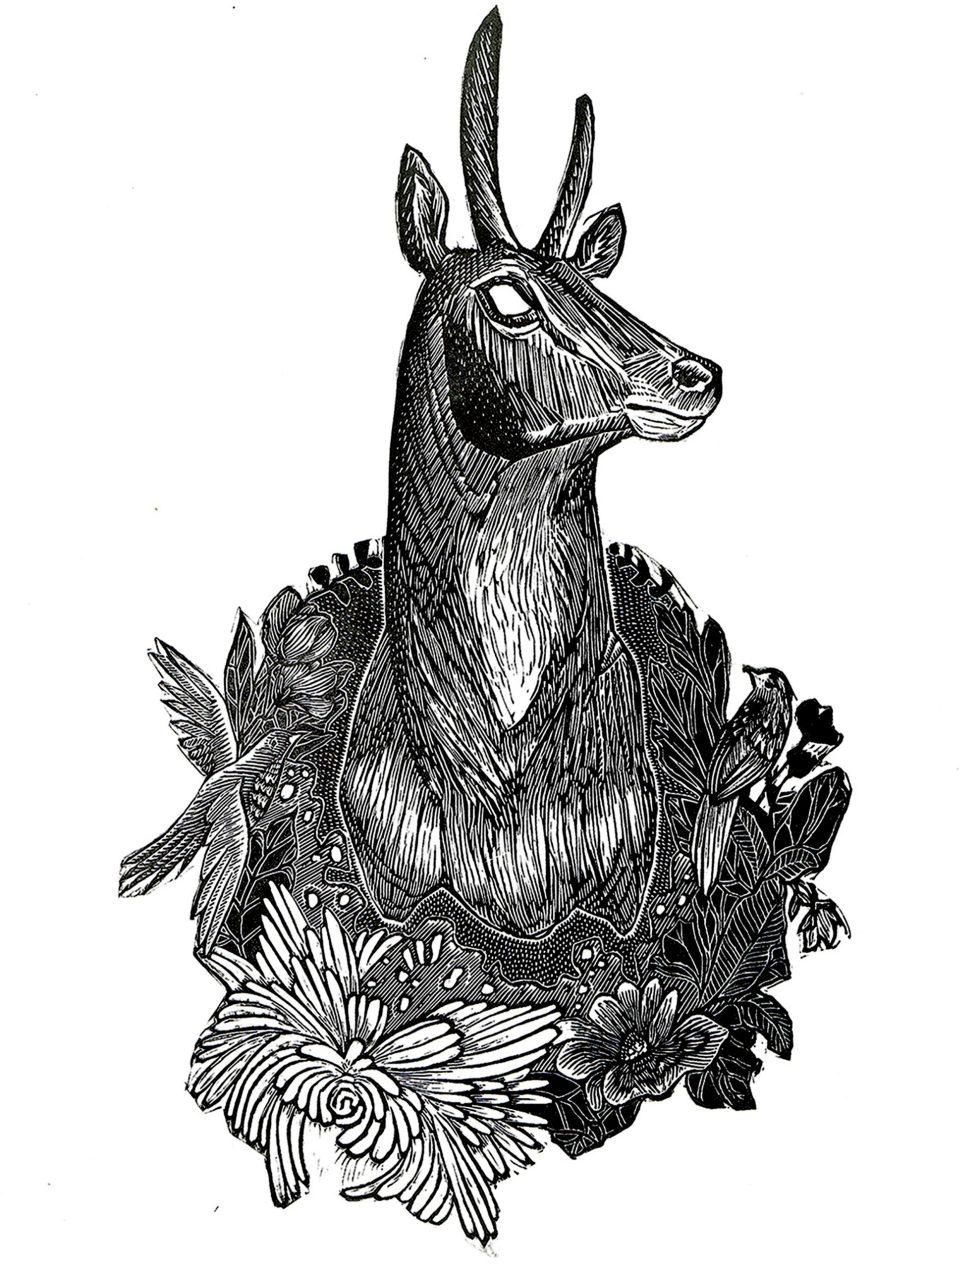 Trophy II Antelope Print Edition by Johanna Mueller